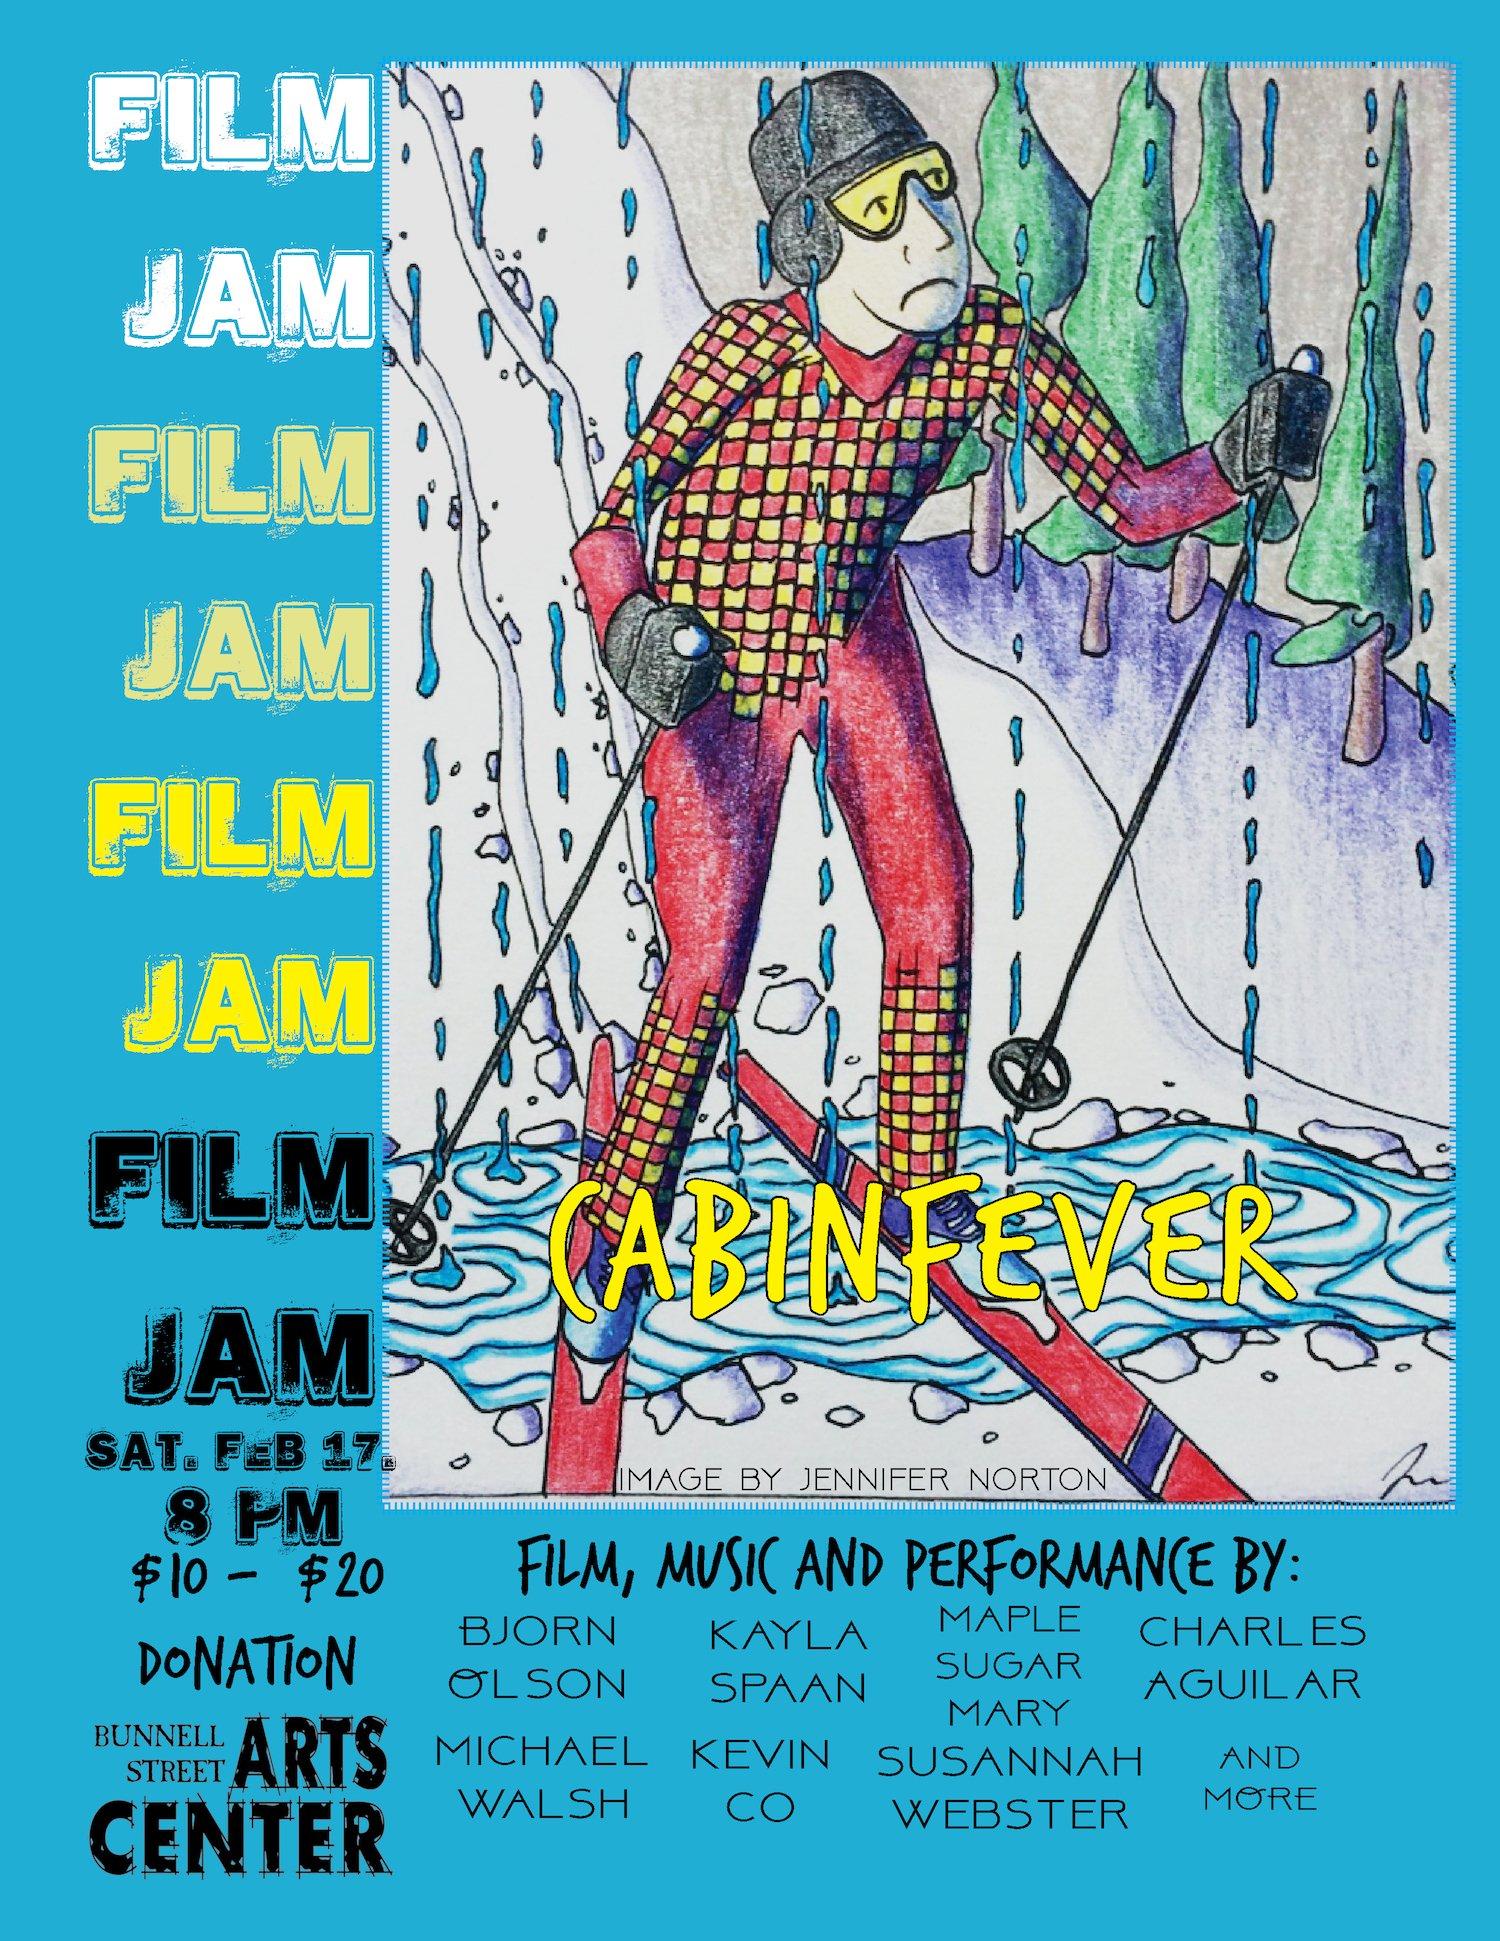 Film Jam: Cabin Fever, Saturday February 17th, 8p